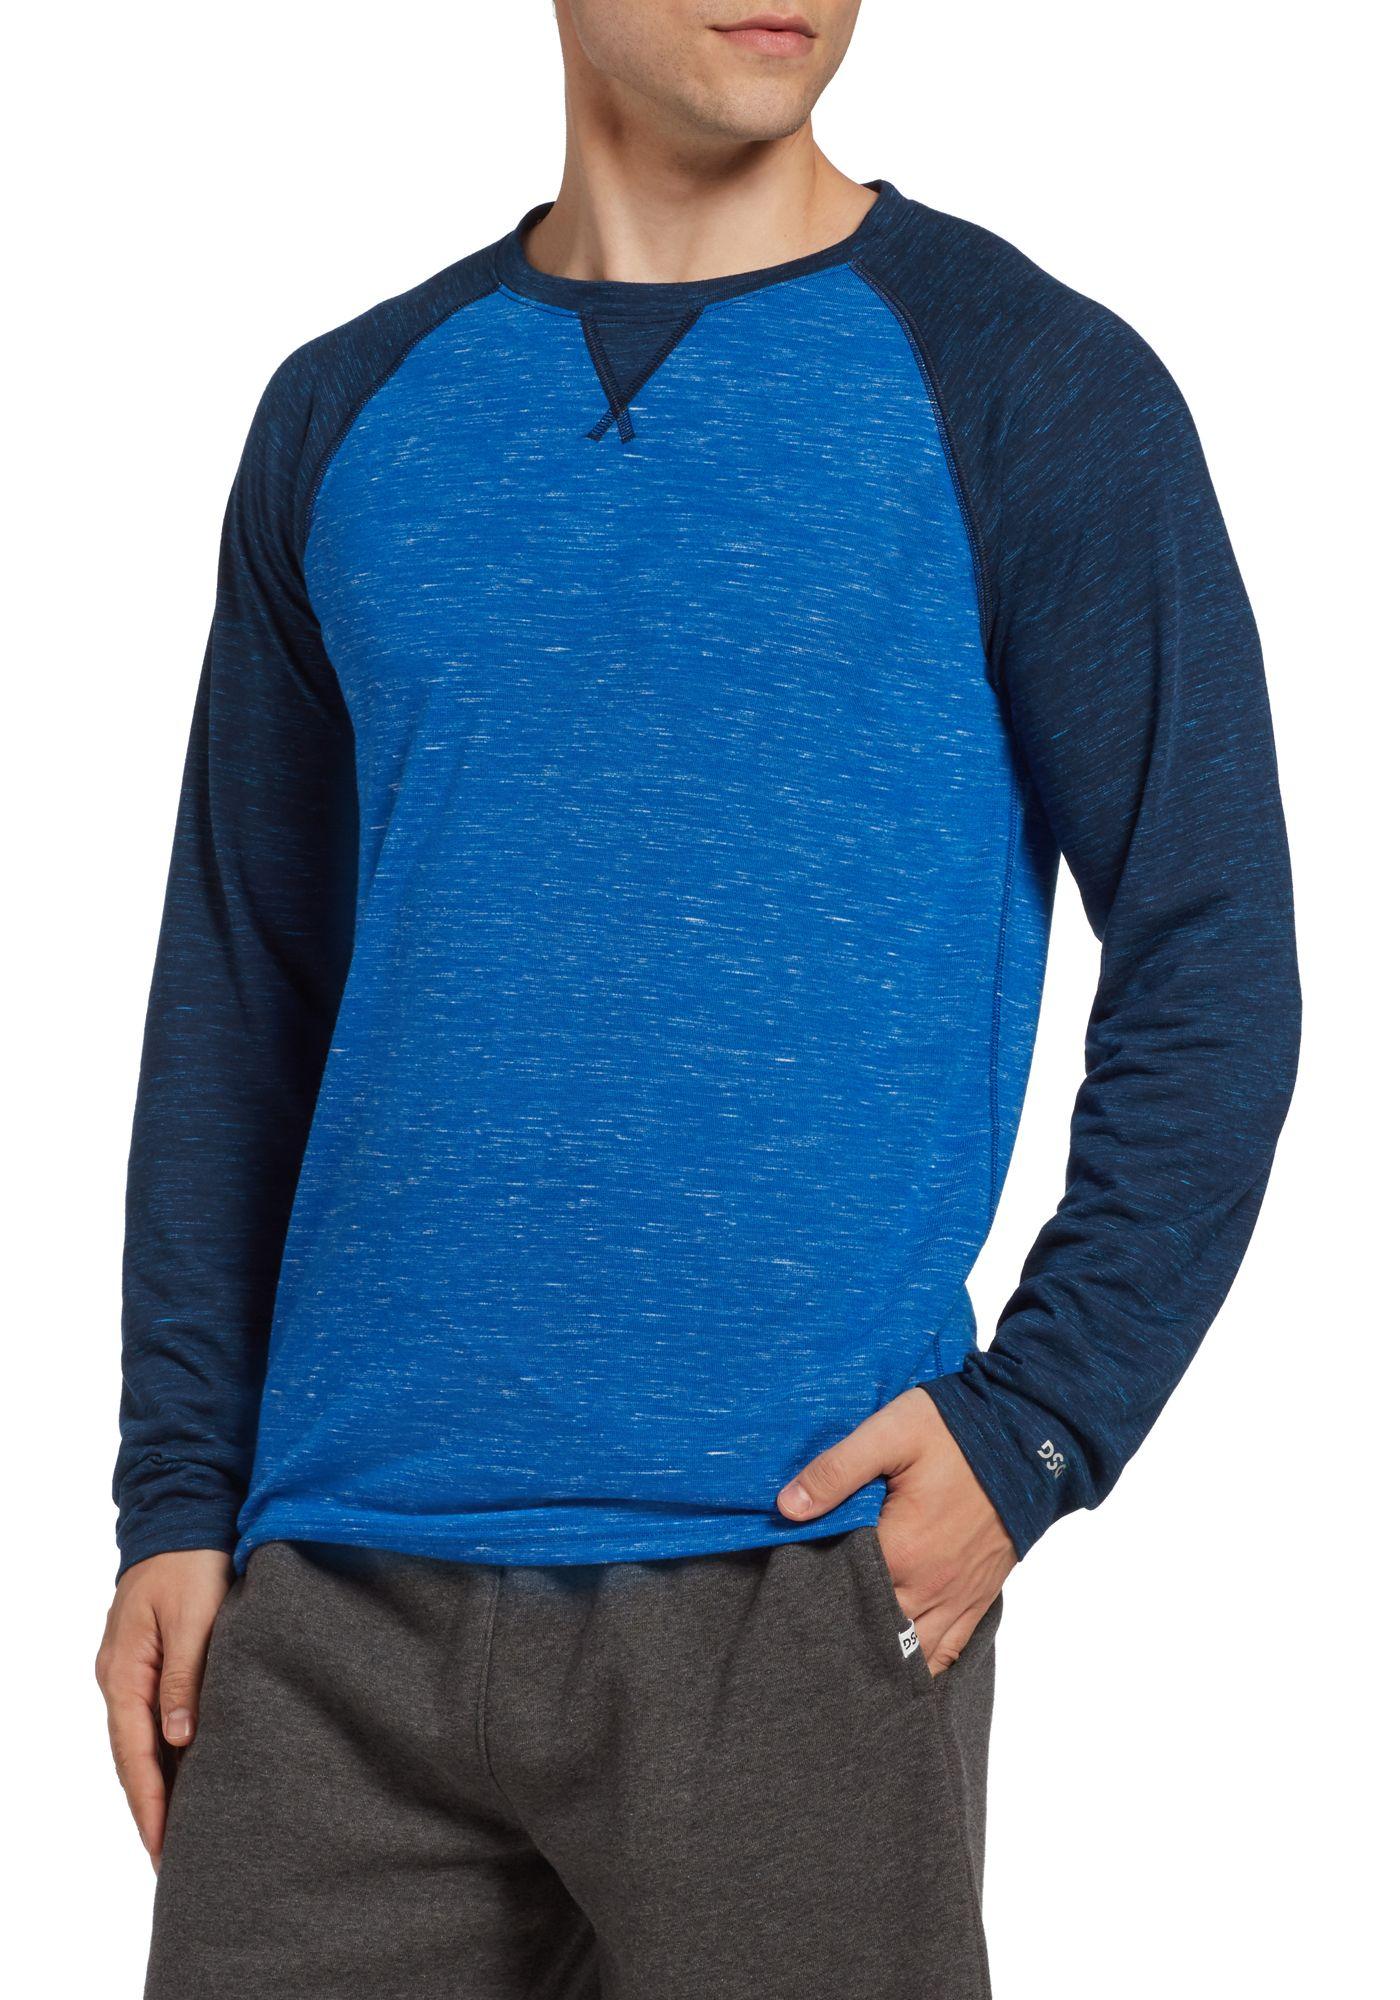 DSG Men's Cotton Training Long Sleeve Shirt